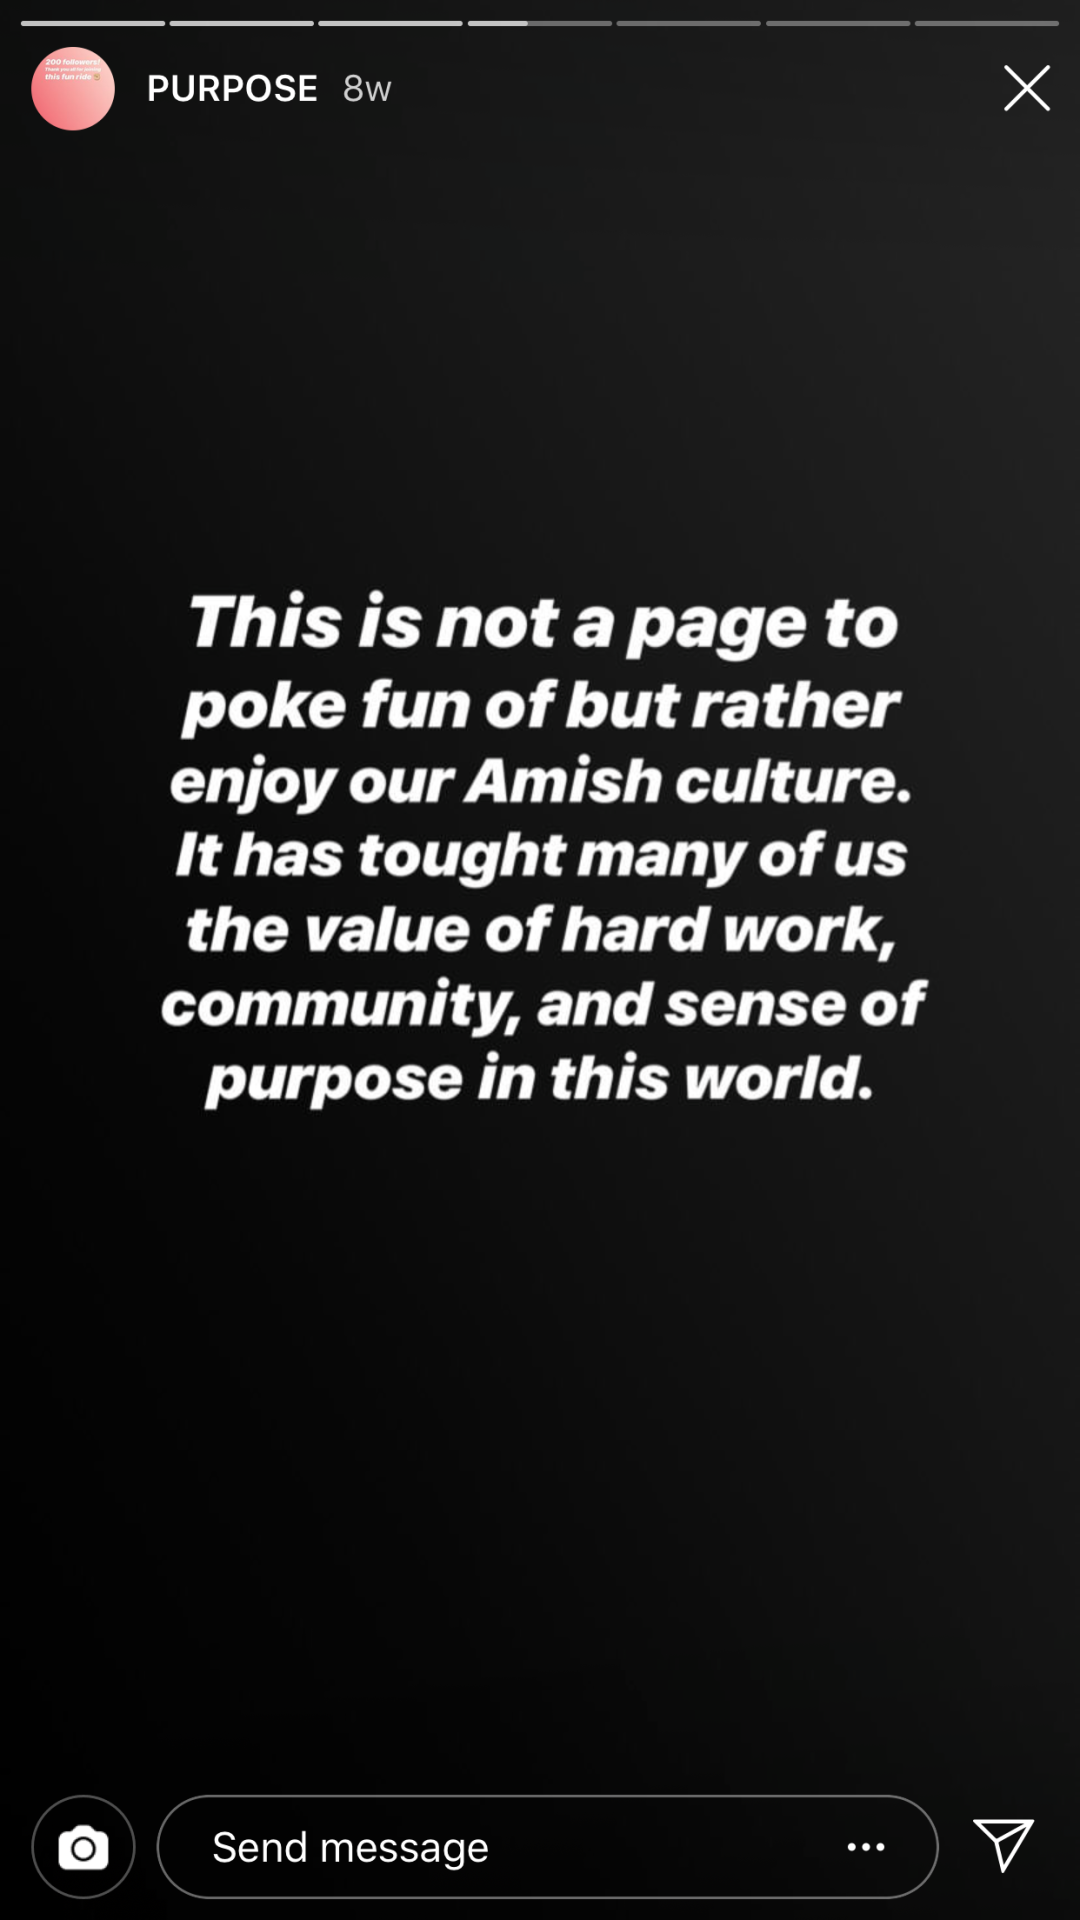 @Amish_Memes' story